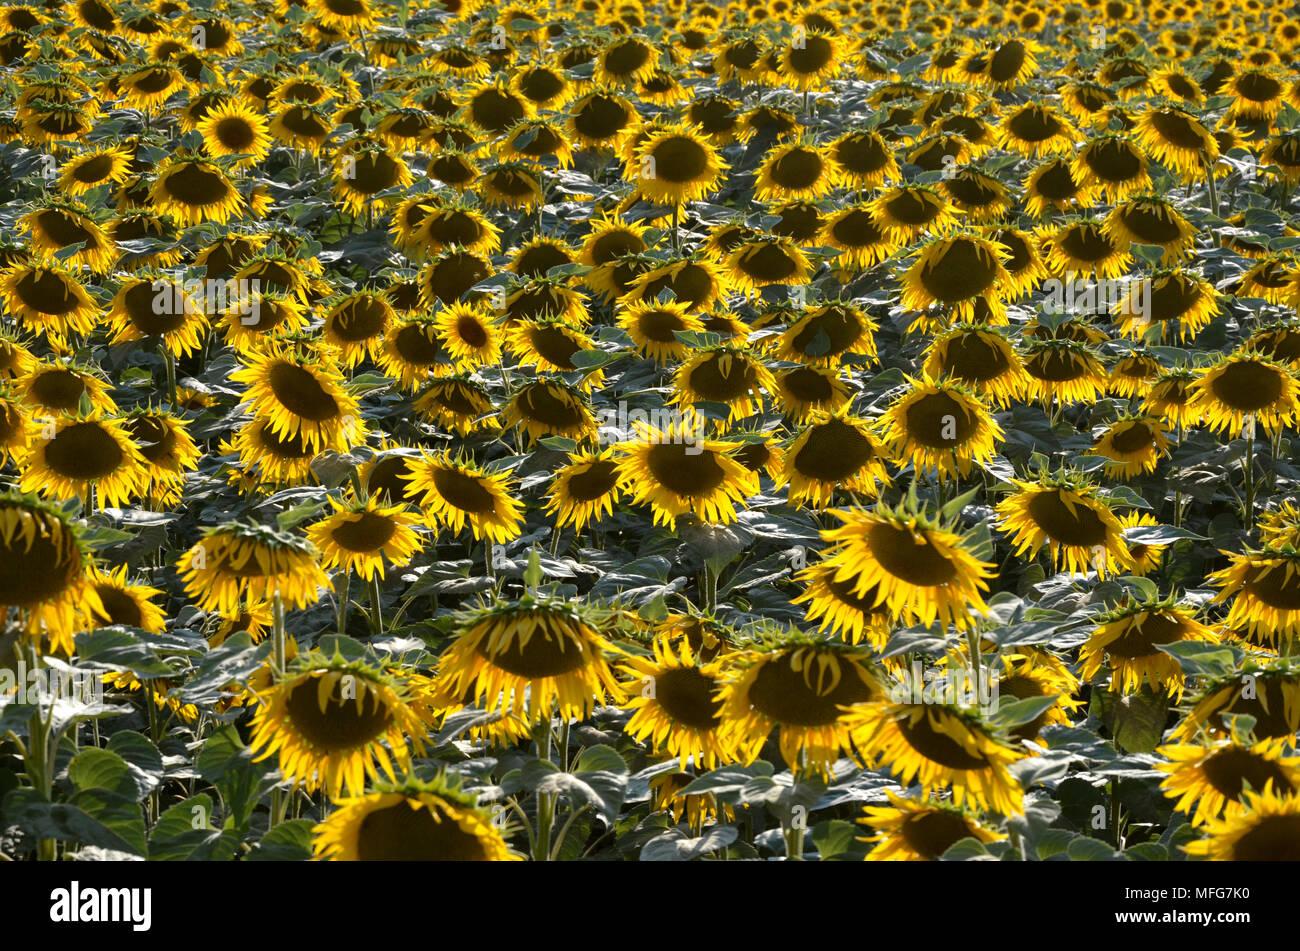 Sunflowers field summer landscape - Stock Image